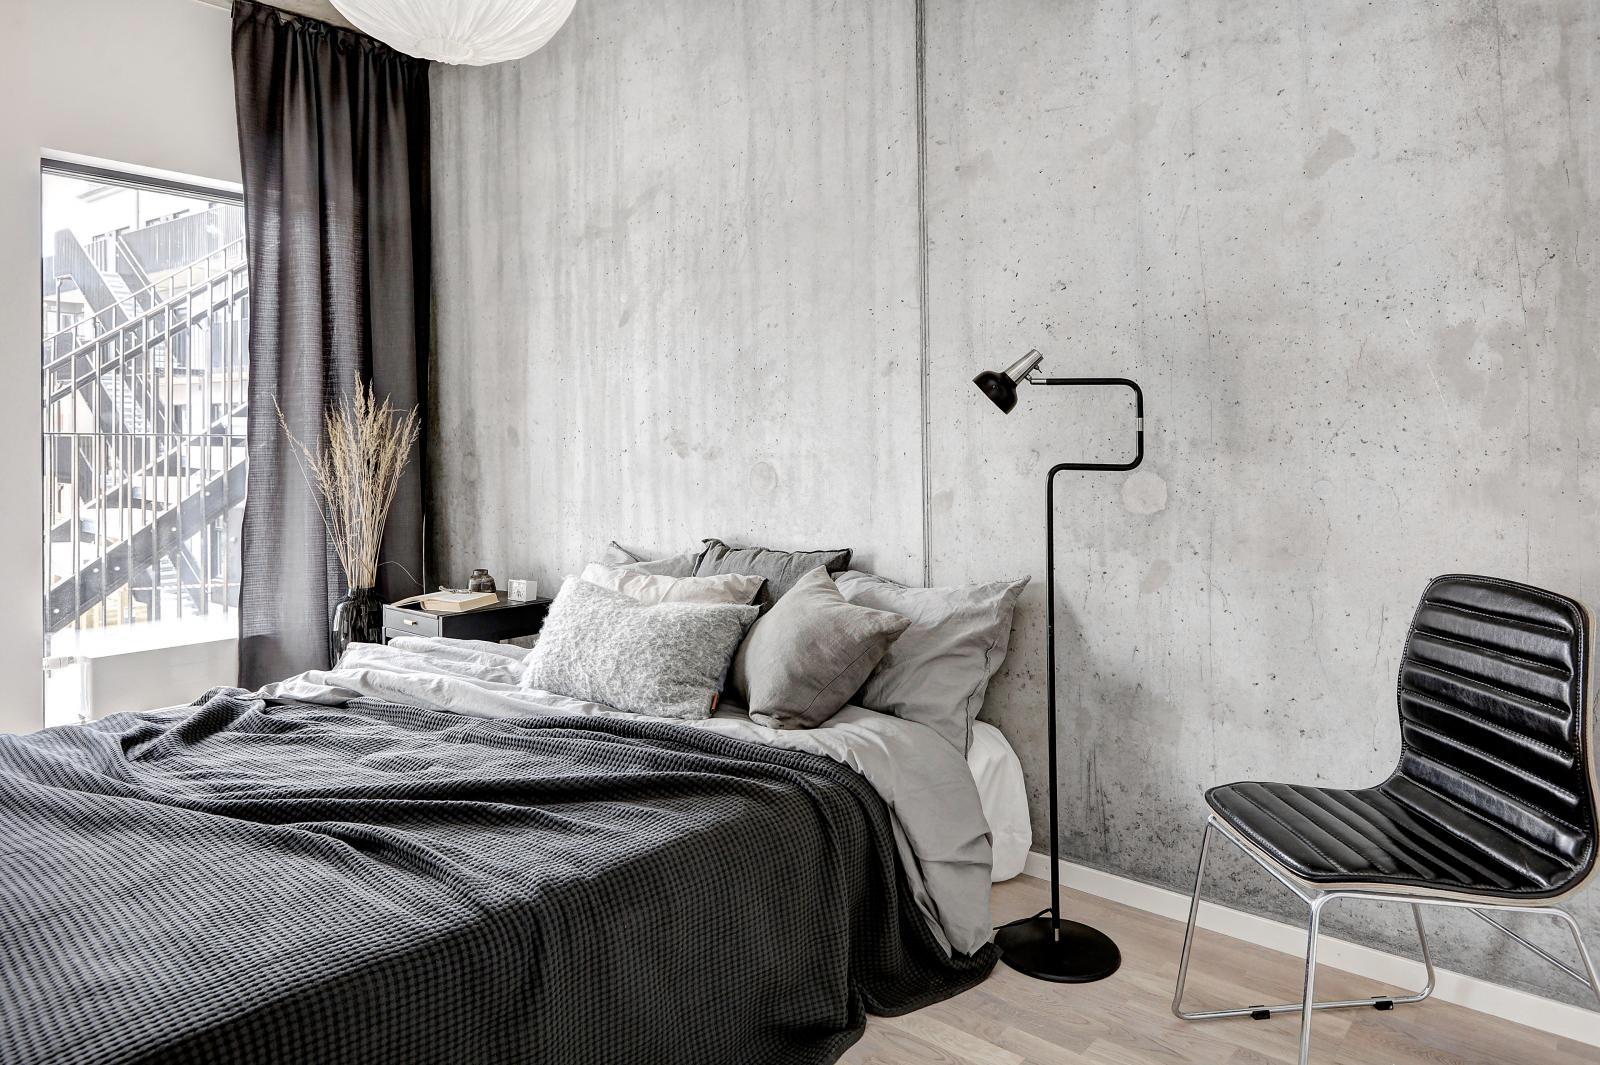 Live work loft for sale in Malmo, Sweden